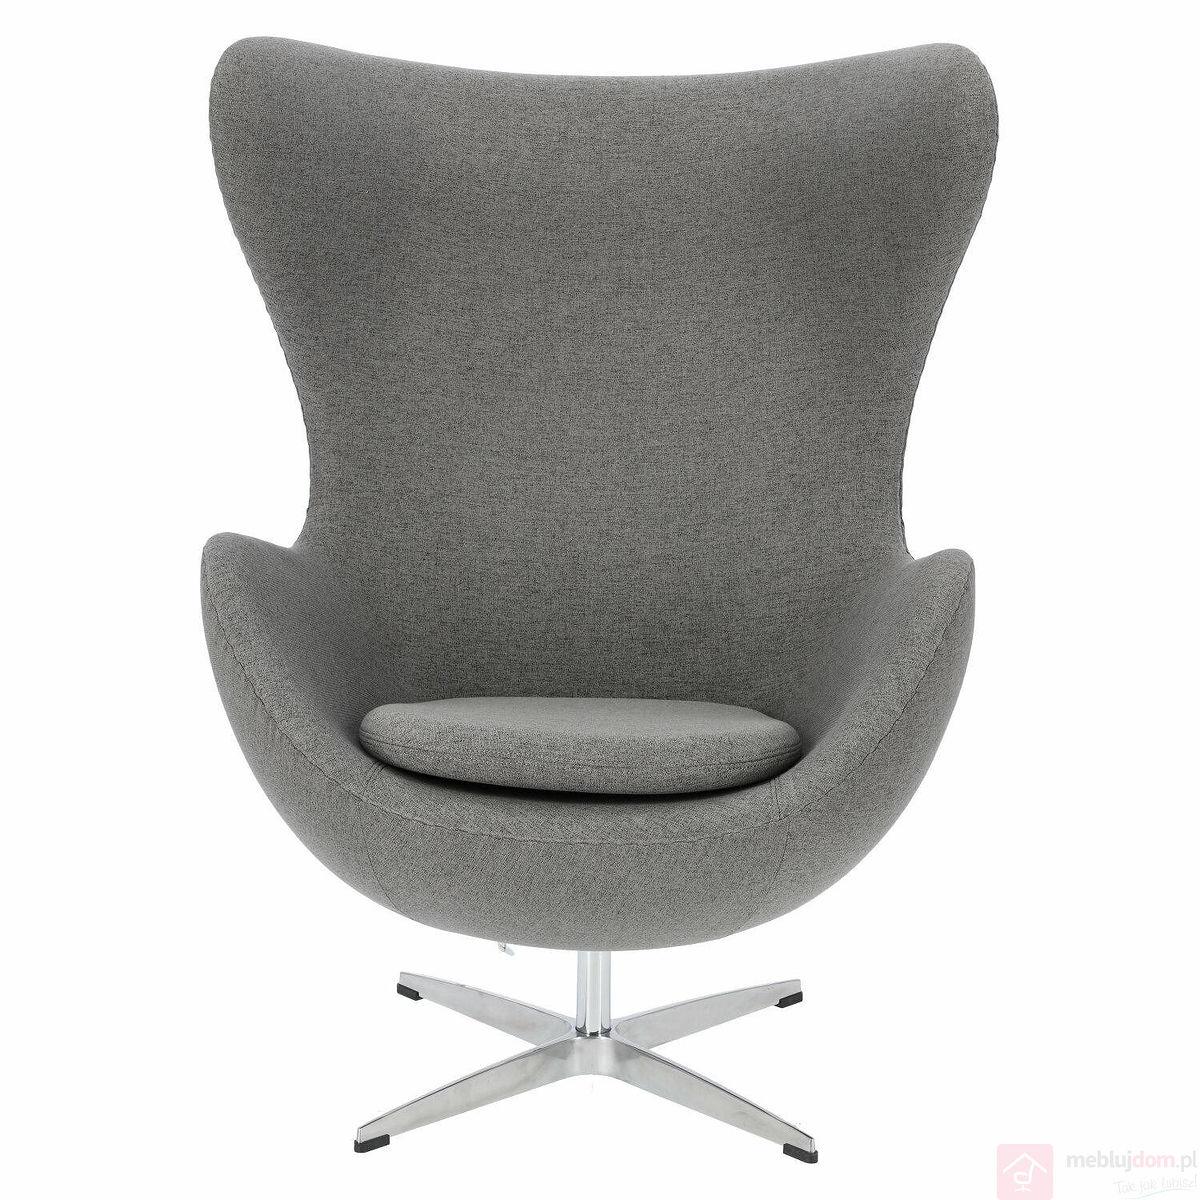 Fotel Jajo Easy Clean Premium antracyt